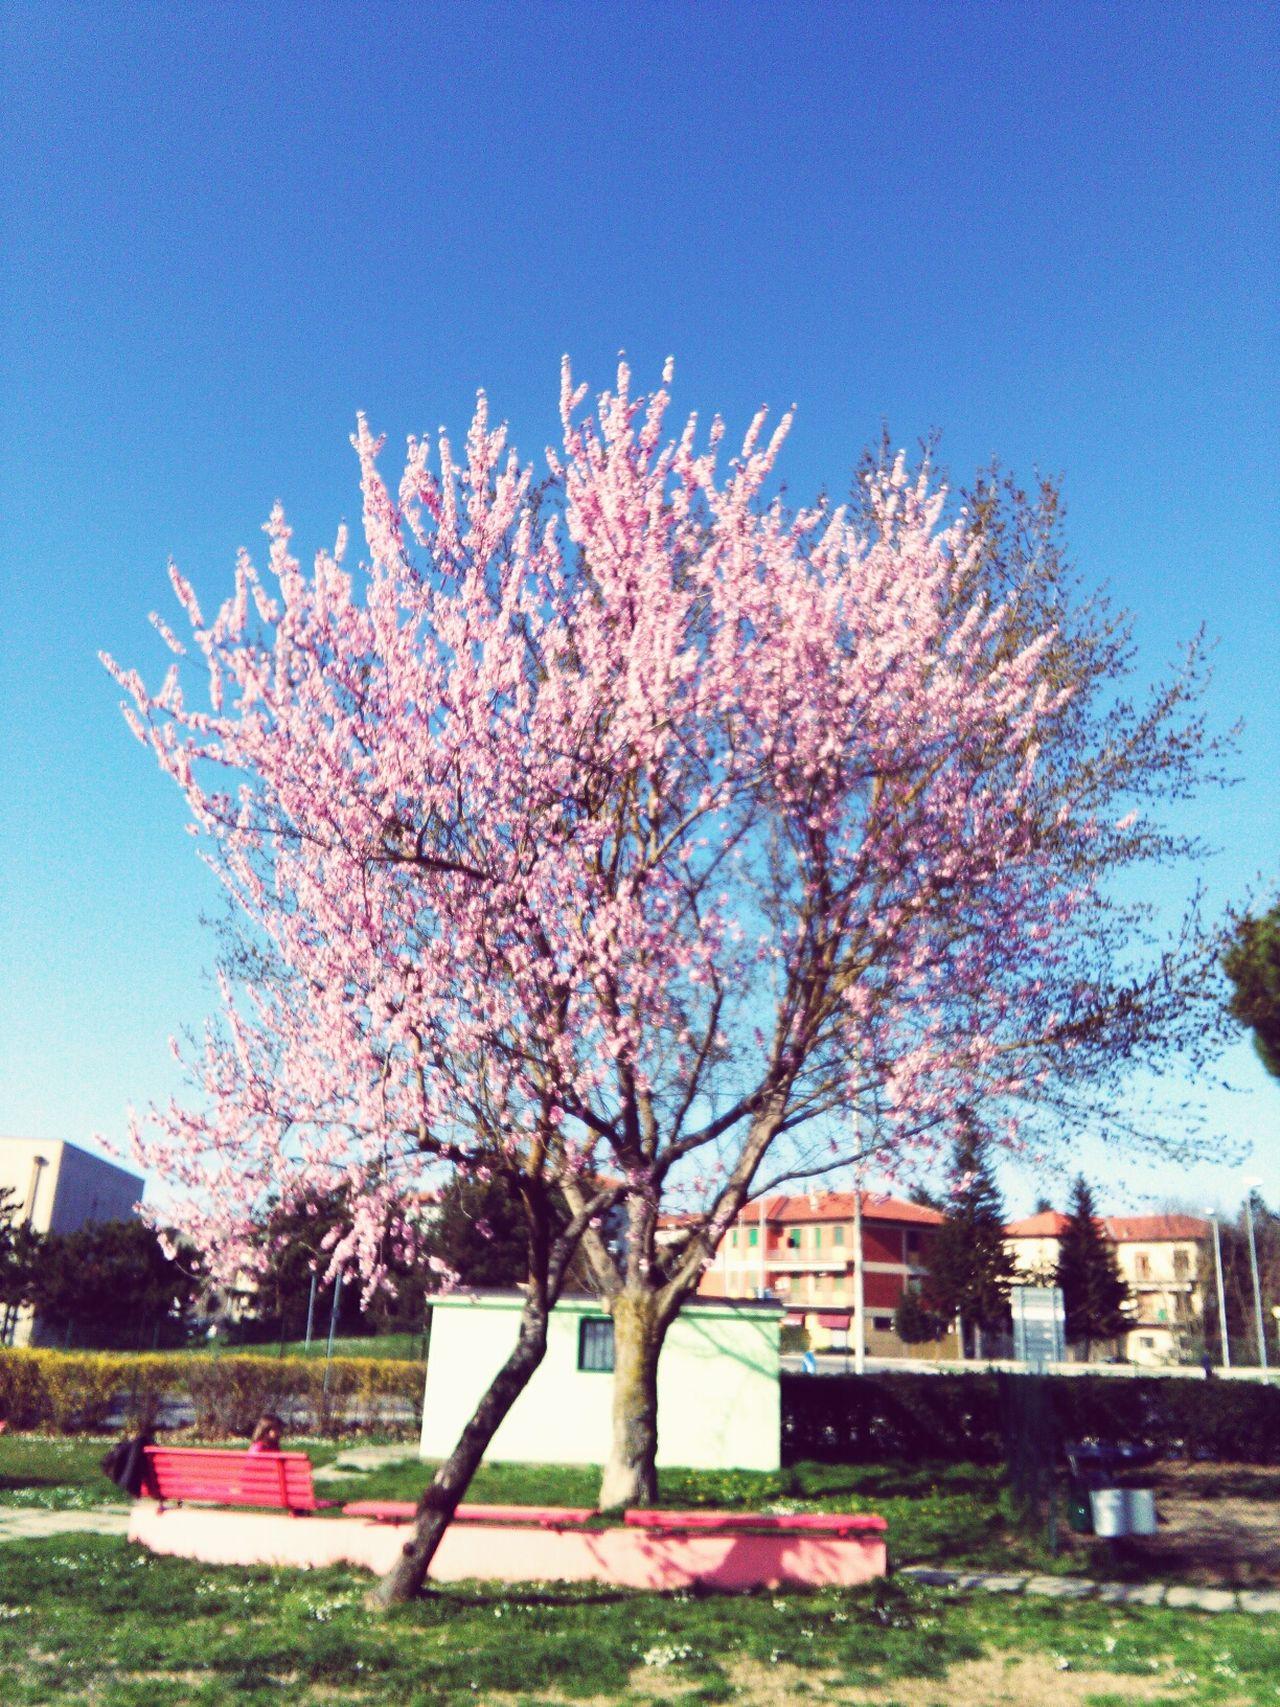 Primavera First Eyeem Photo EyeEmNewHere